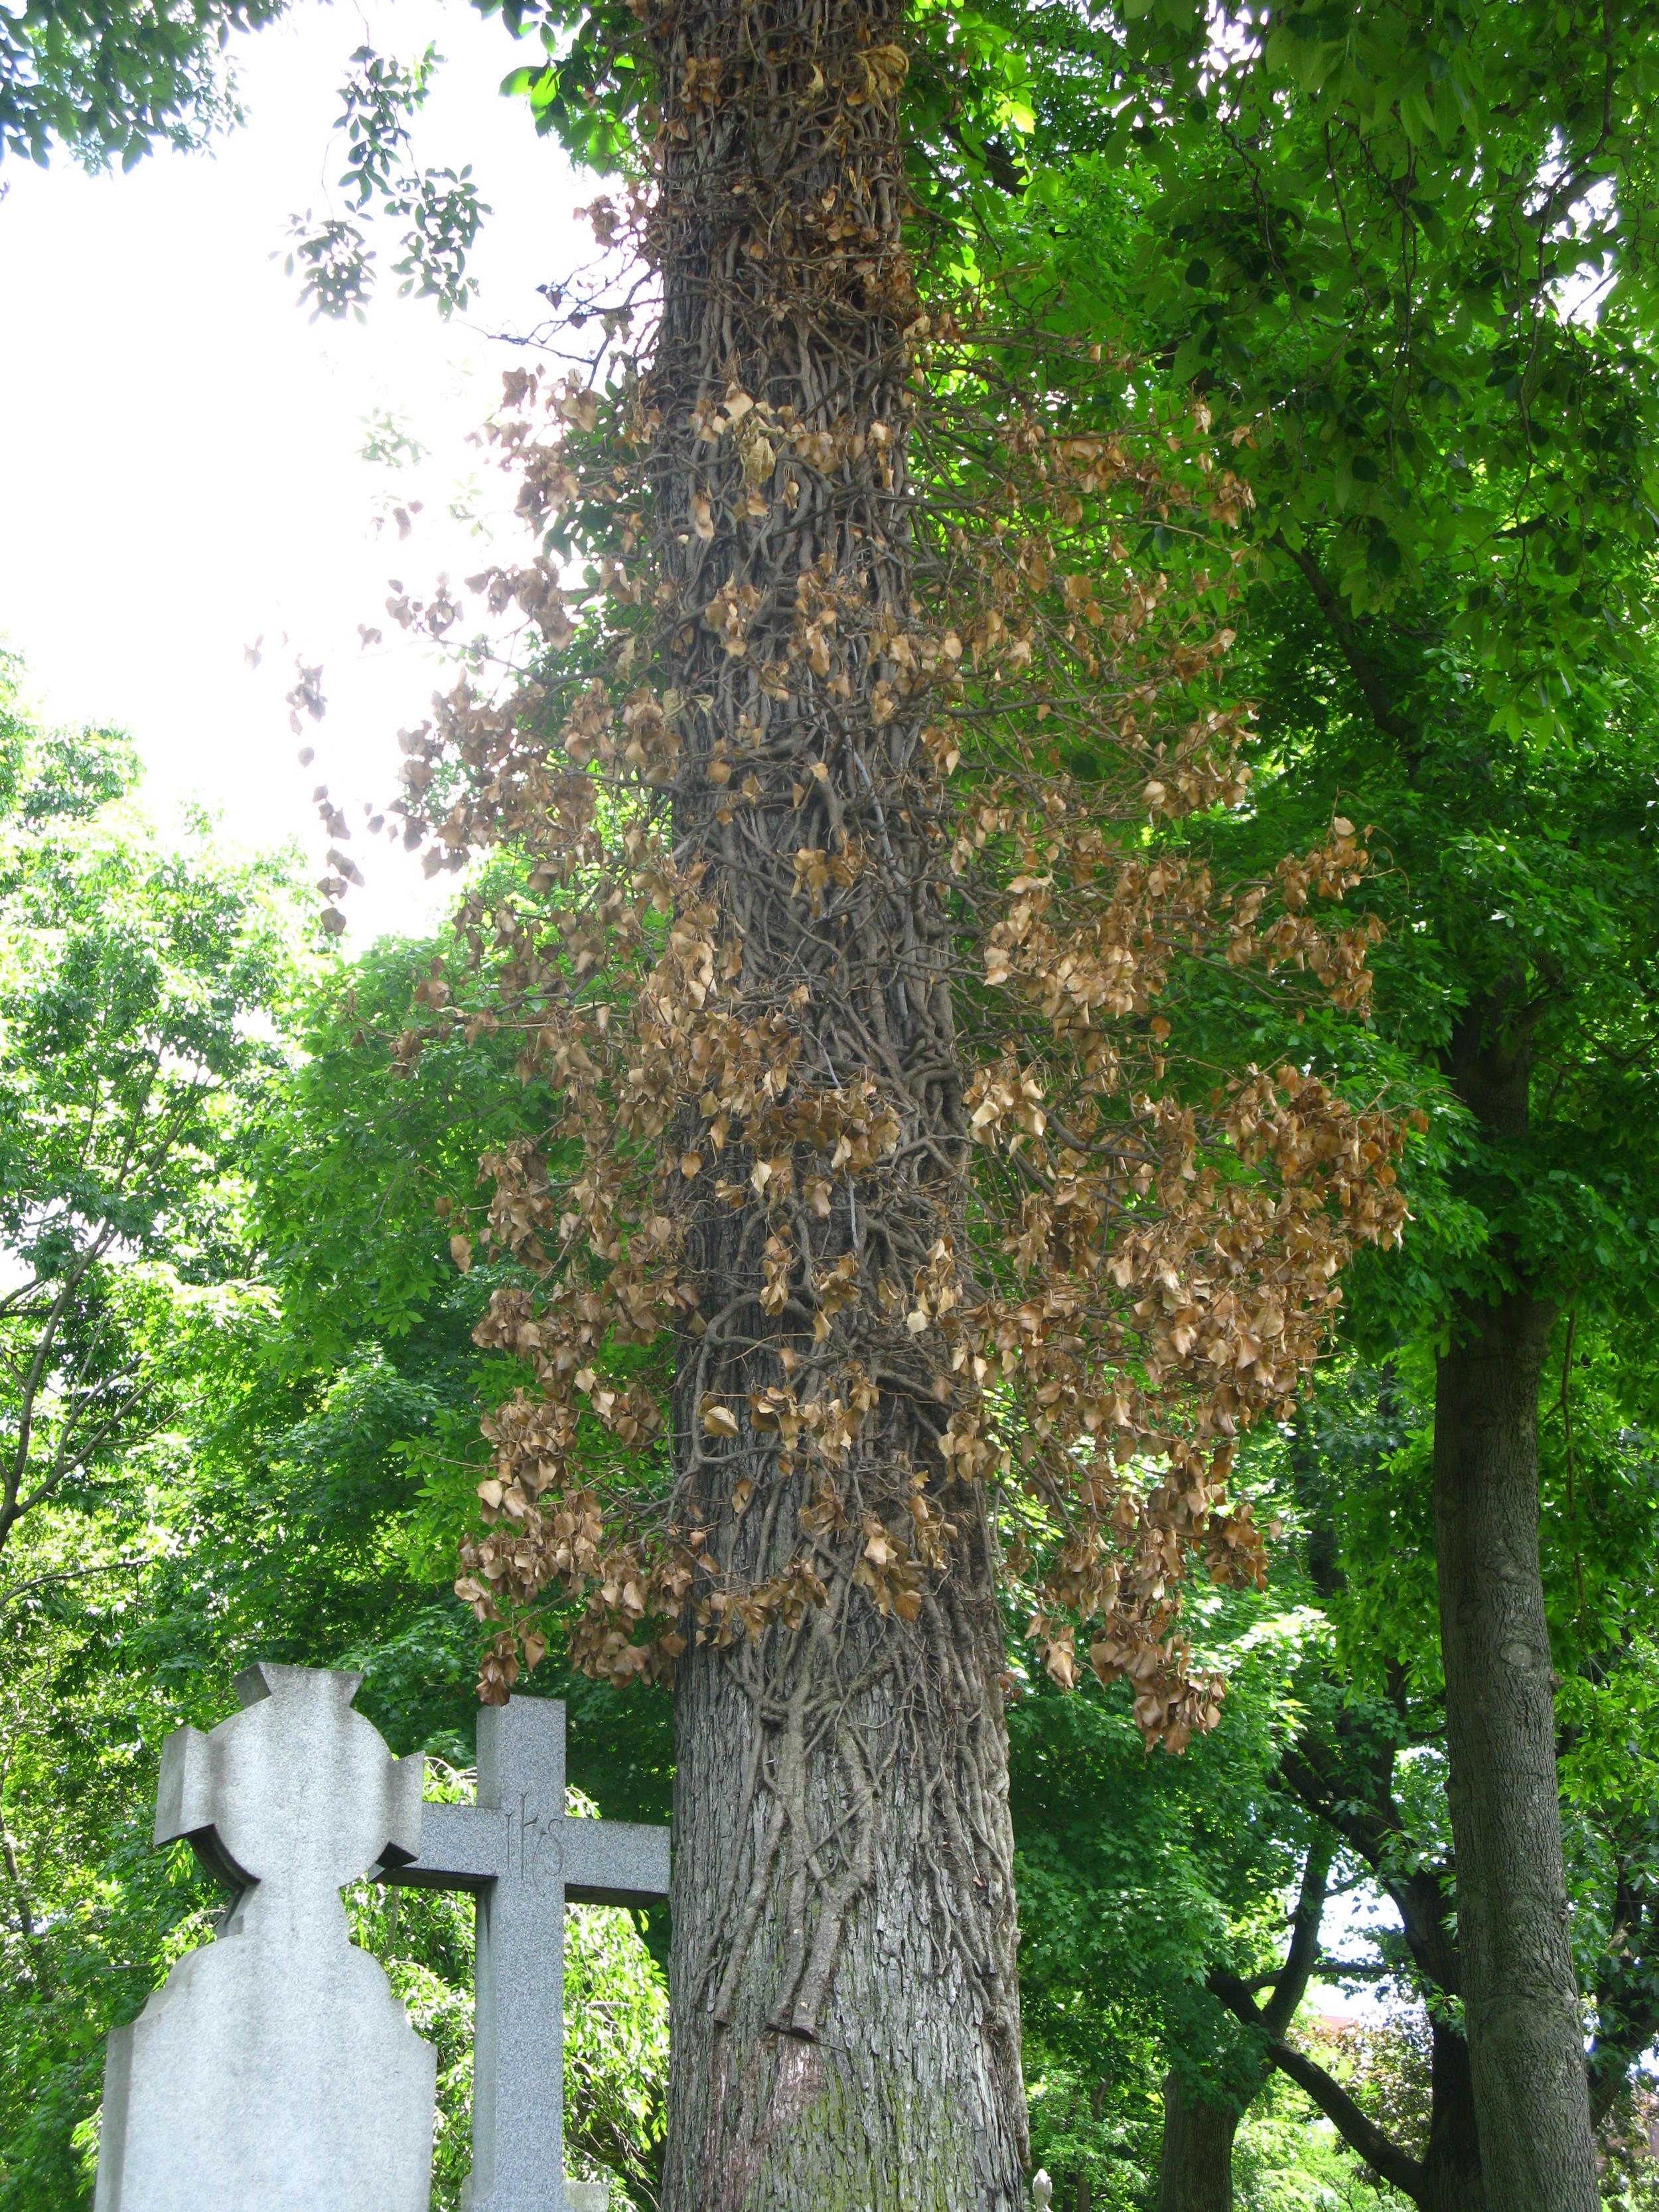 Toxicodendron radicans Anacardiaceae